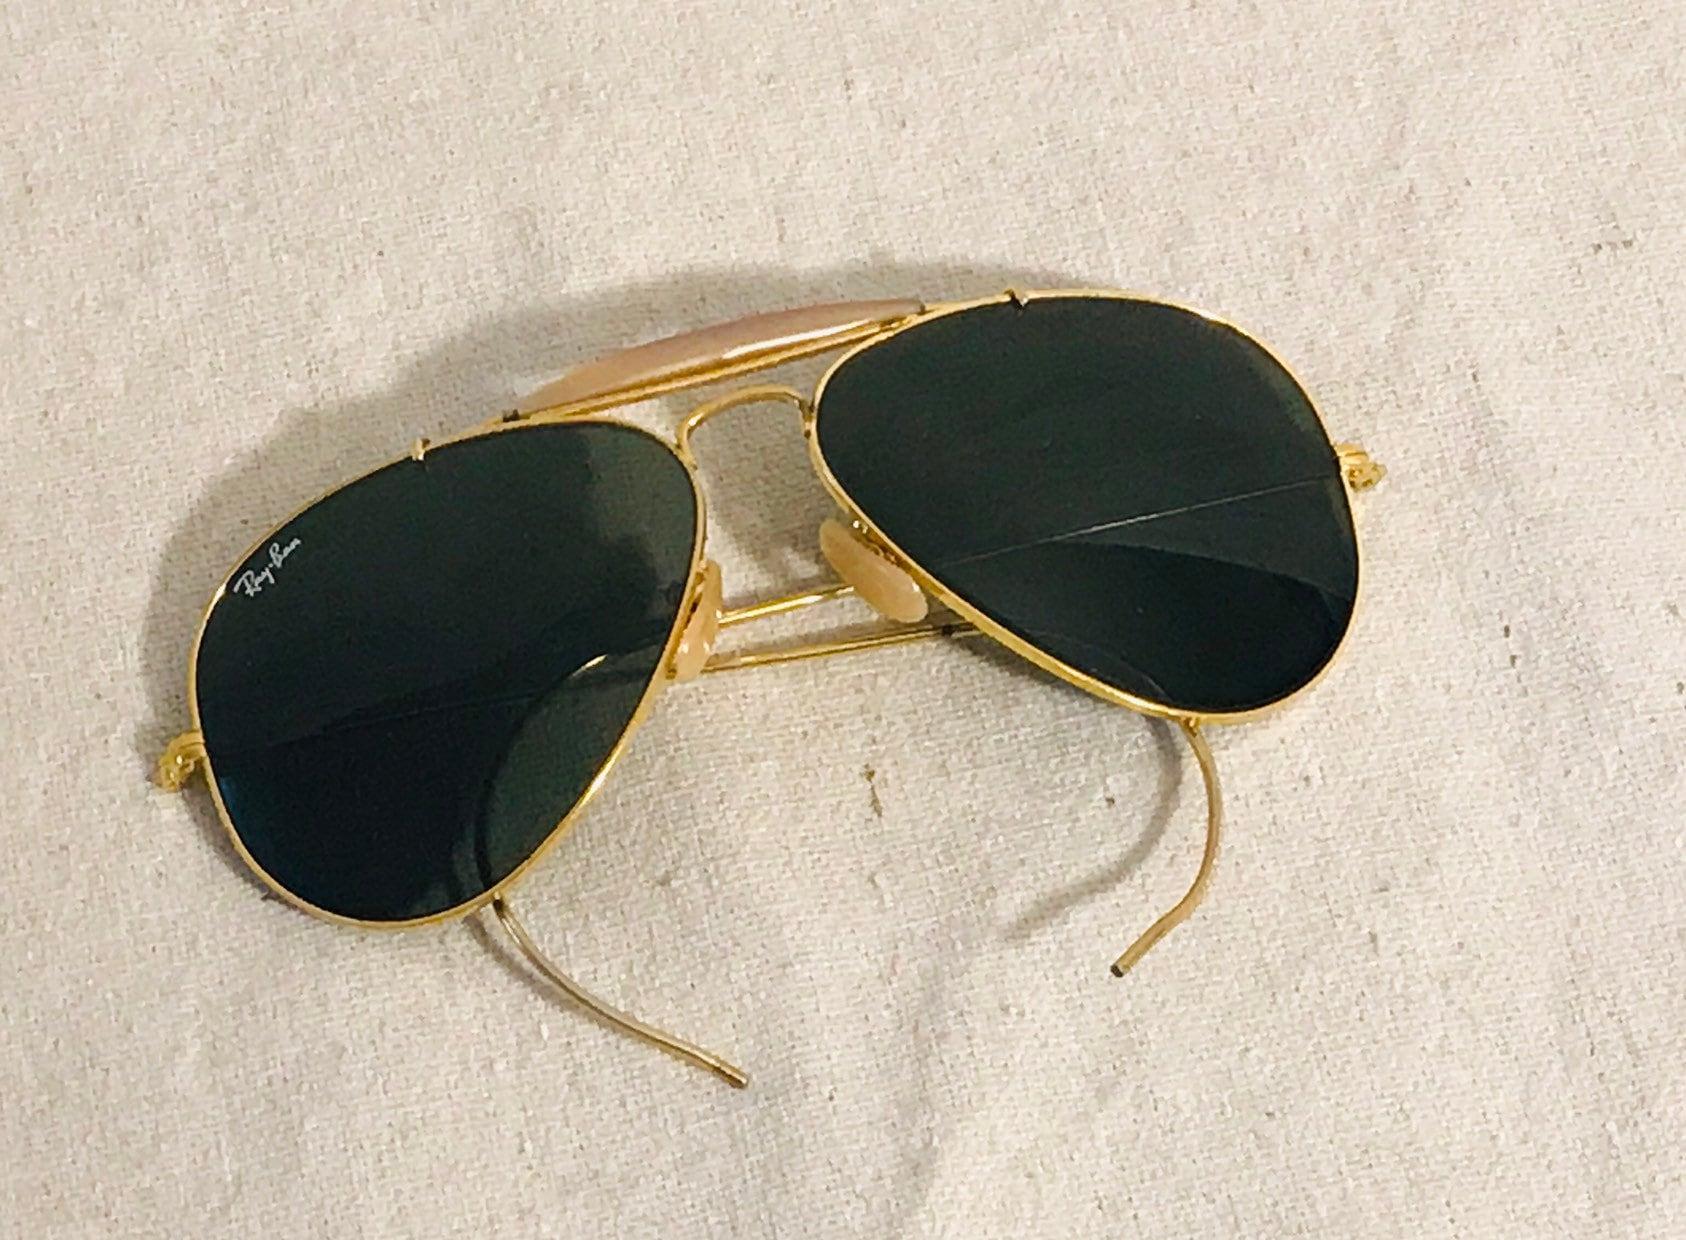 4a6c7a77b2 Vintage Ray Ban Bausch   Lomb aviator sunglasses 58 14